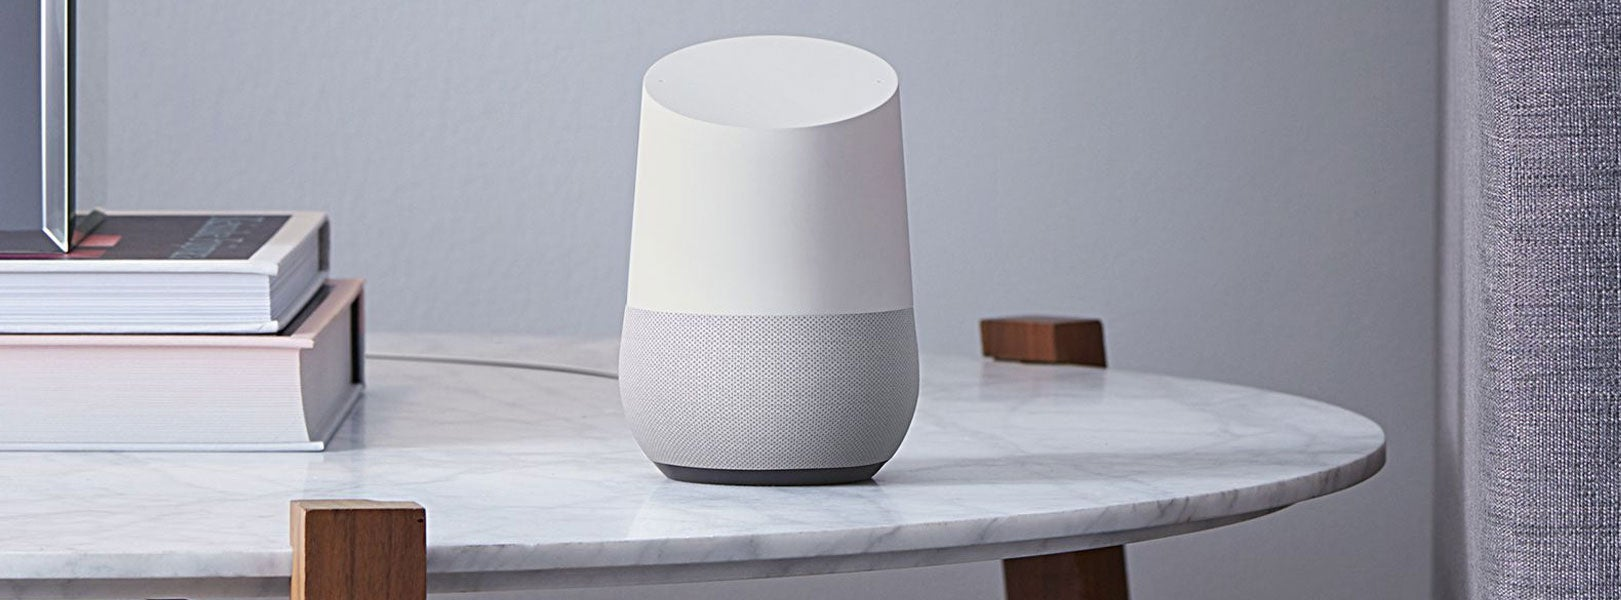 Google Home voice-activated smart speaker